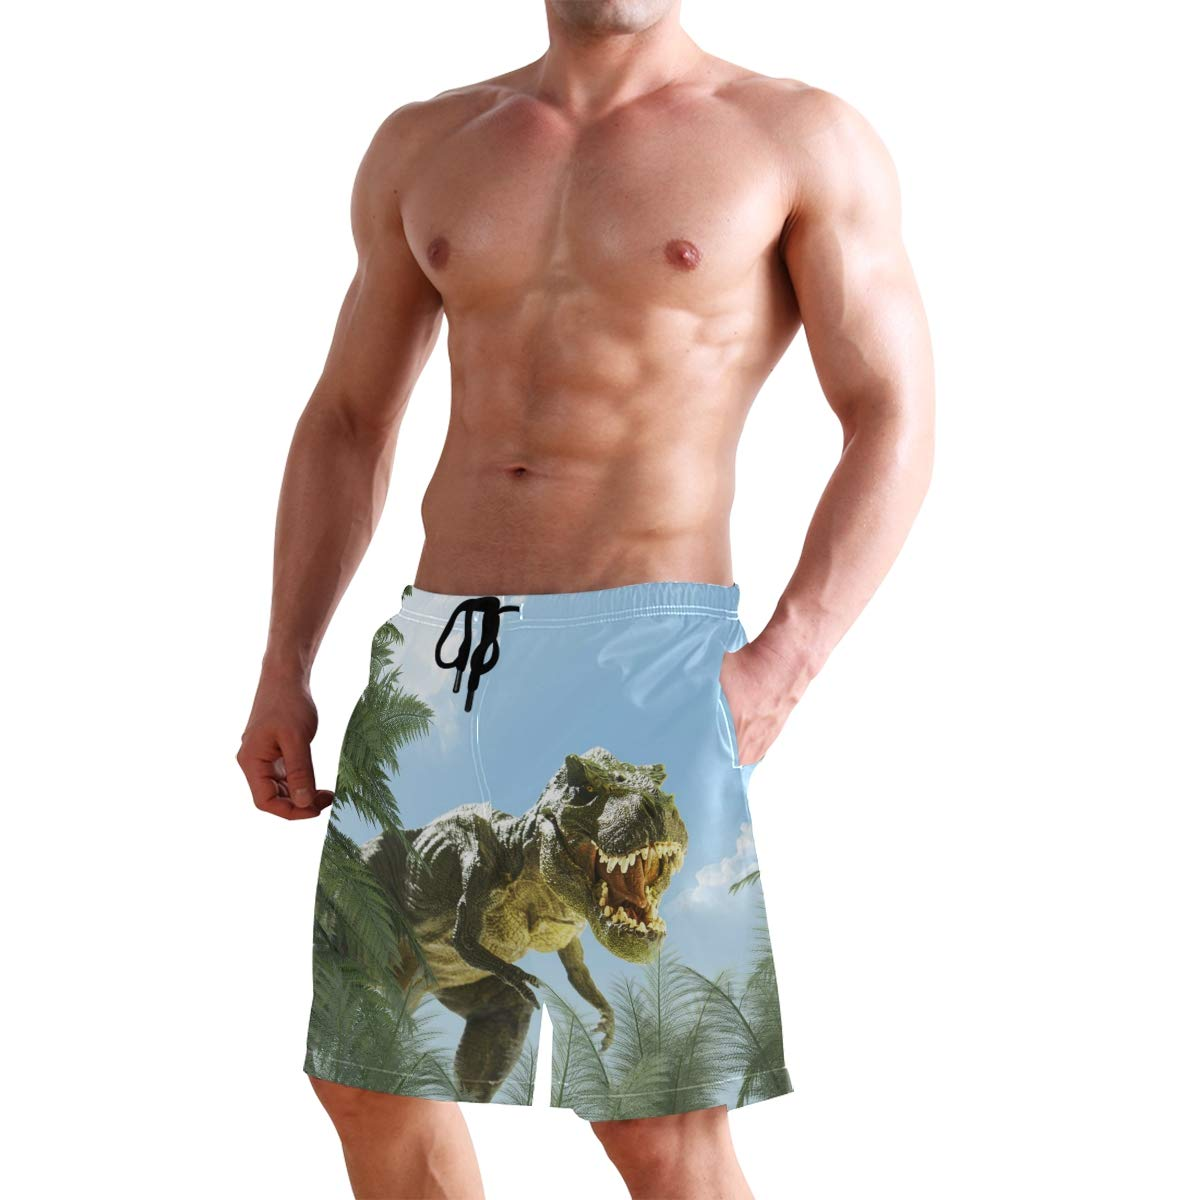 AUUXVA Mens Swim Trunks Animal Dinosaurs Palm Tree Quick Dry Beach Shorts Summer Surf Board Shorts